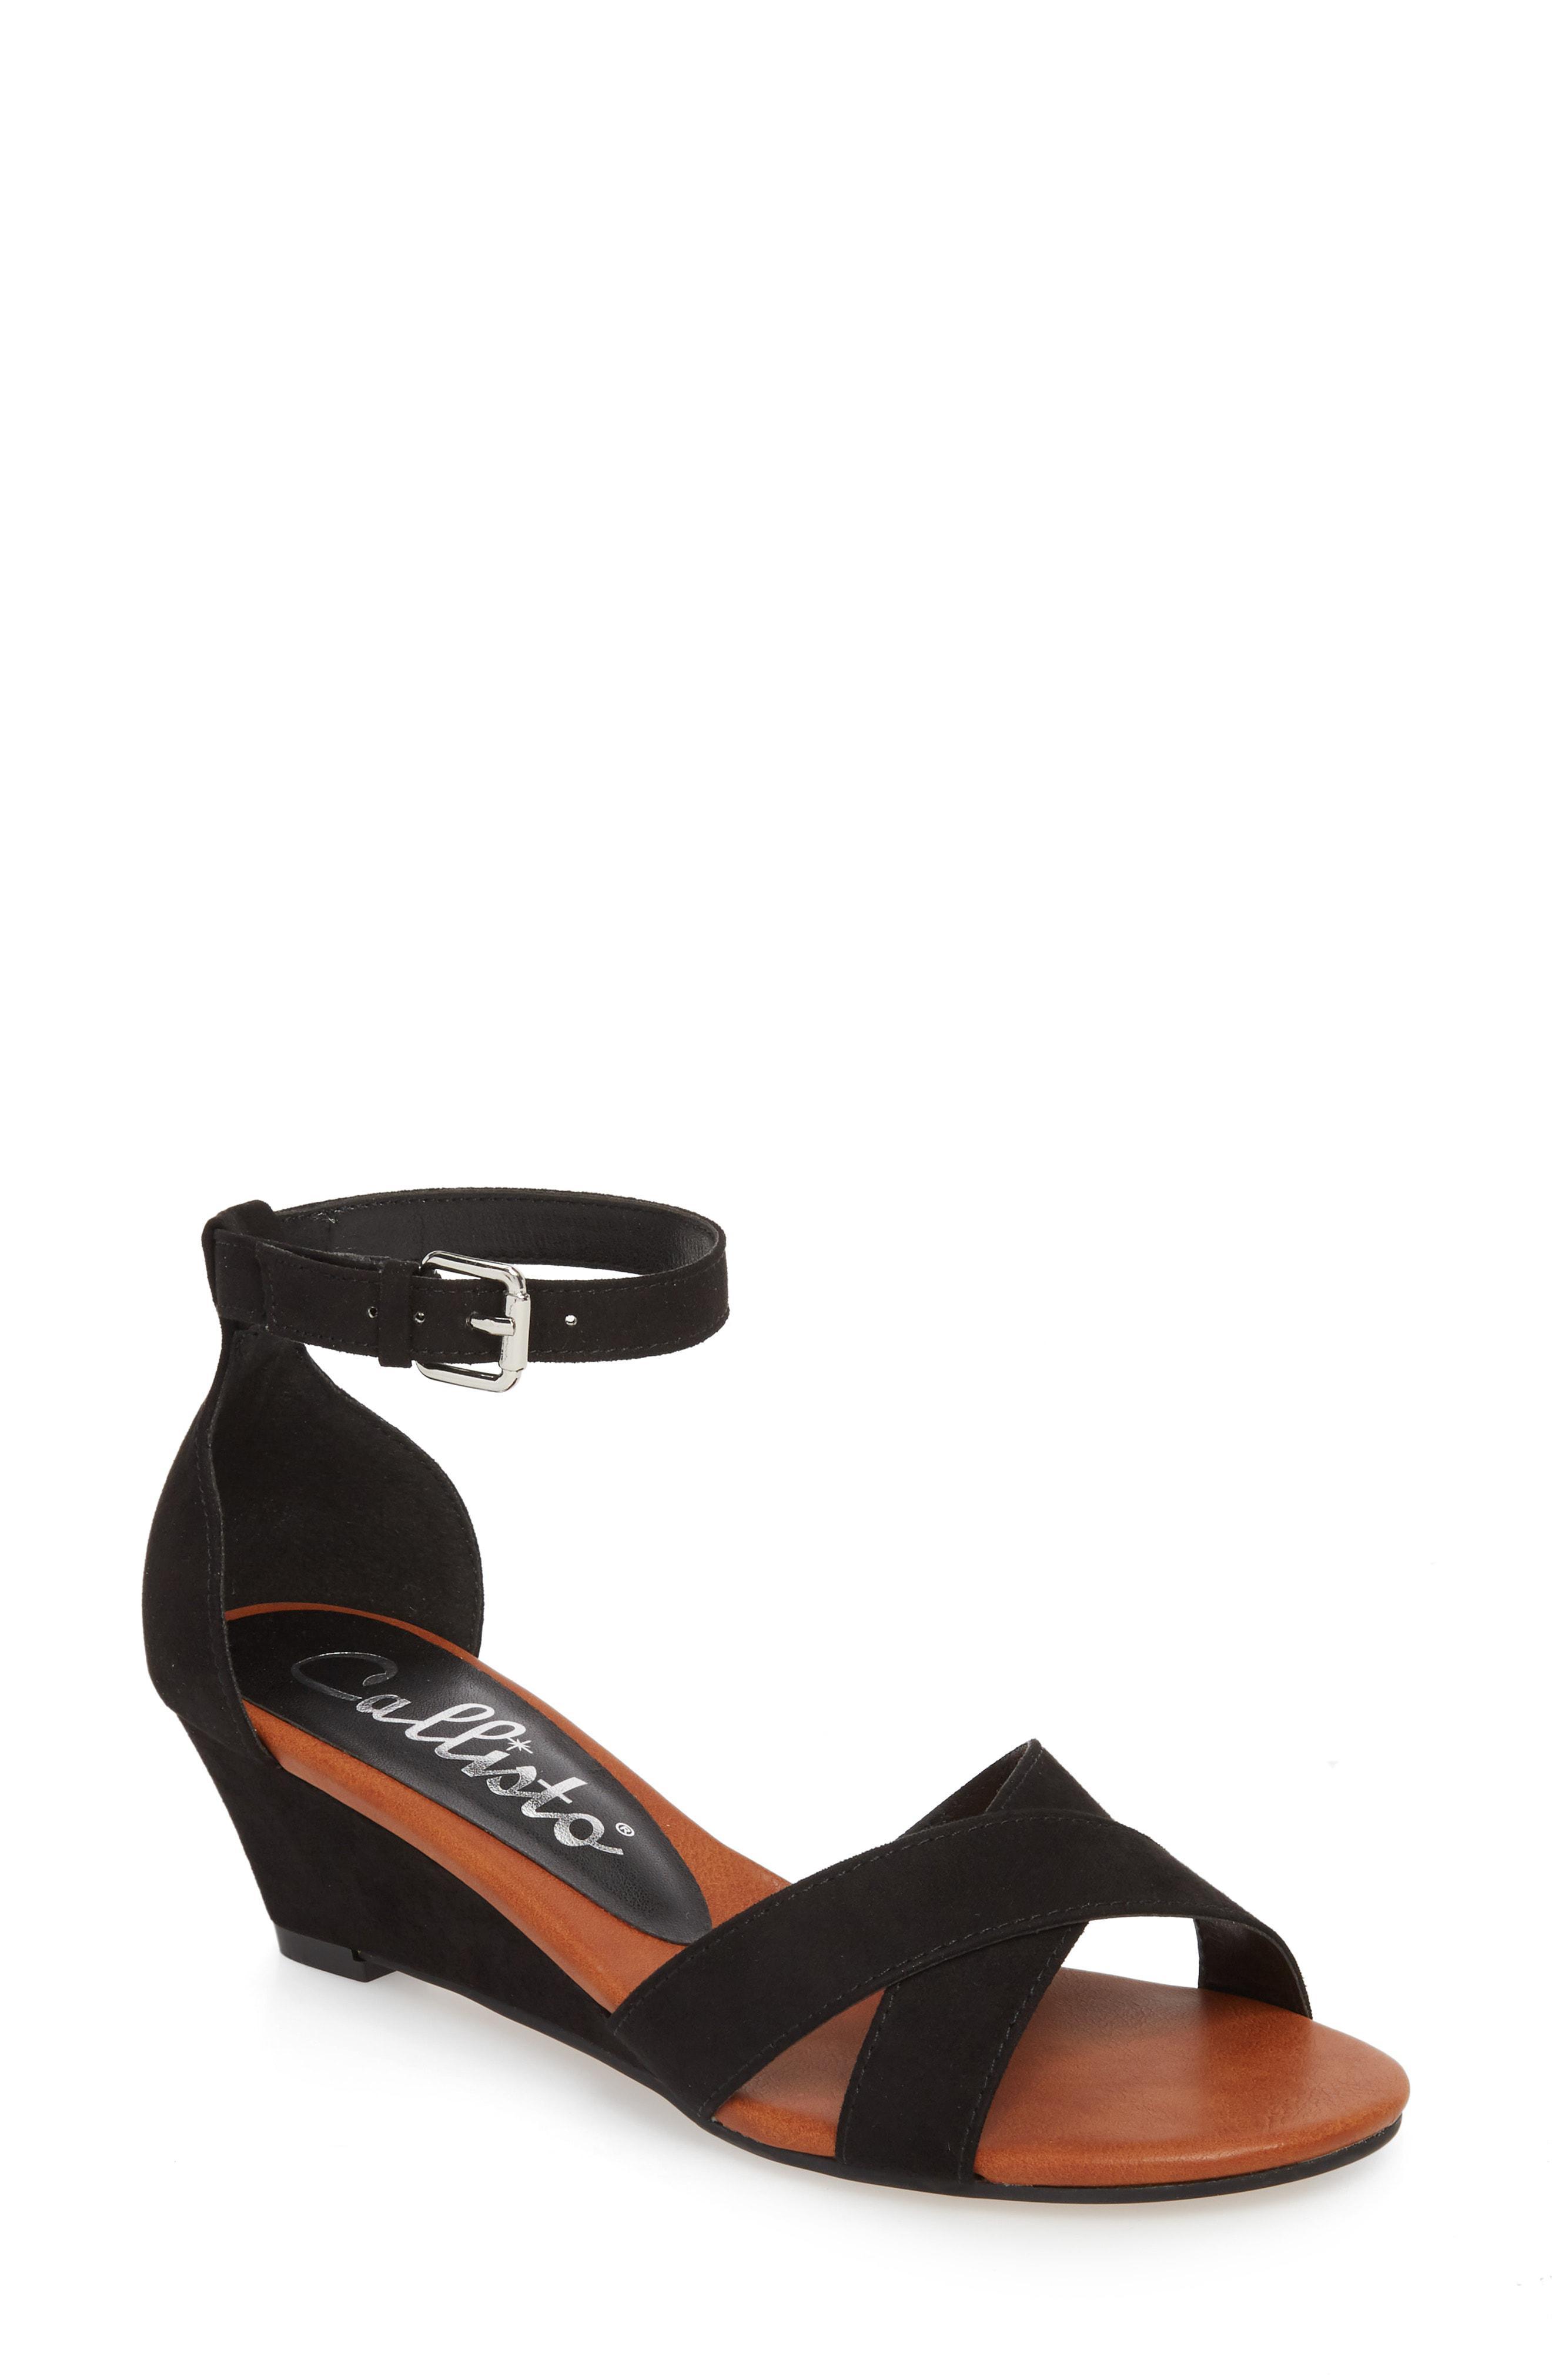 65aab673726 Callisto - Black Strobe Wedge Sandal - Lyst. View fullscreen